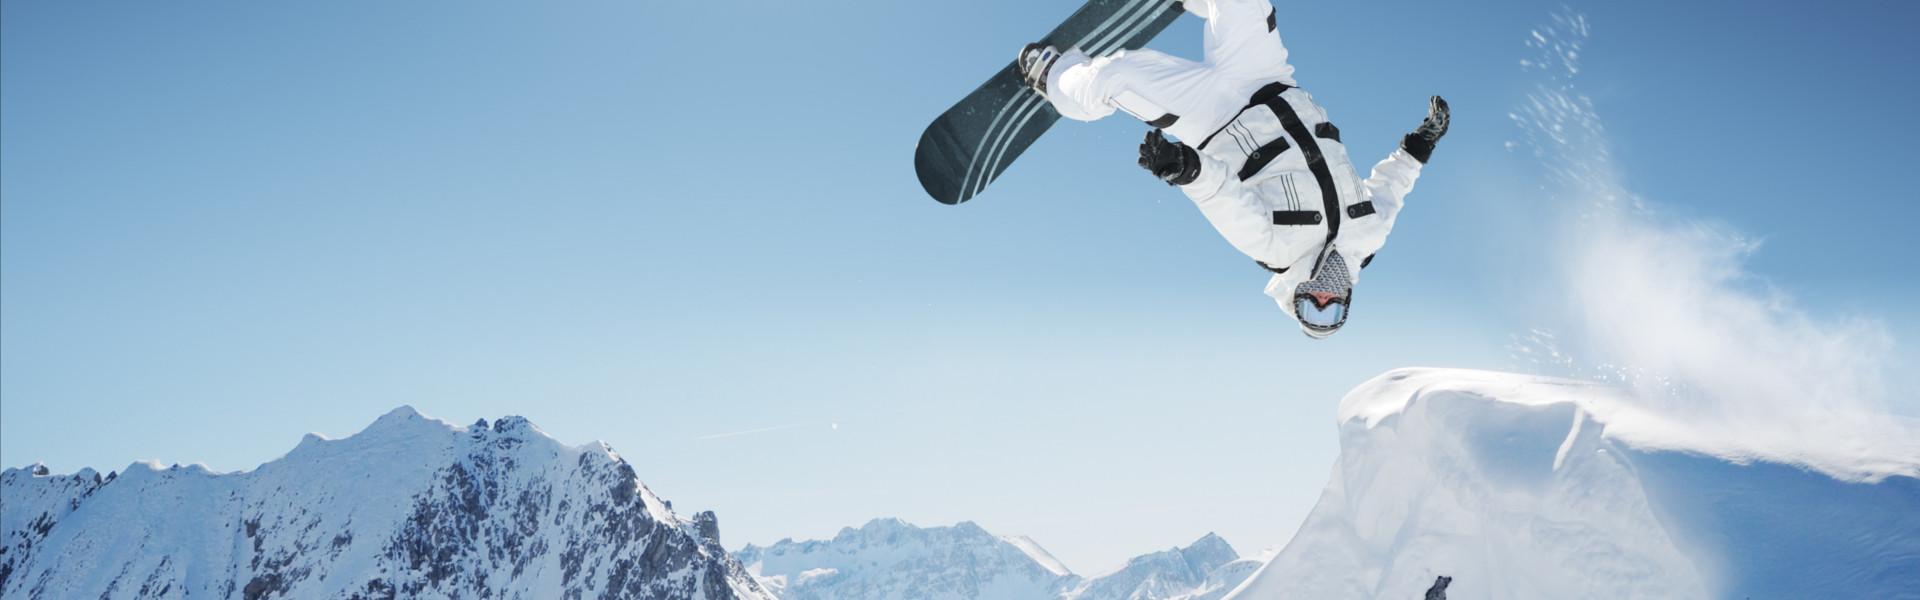 snow_board_jump